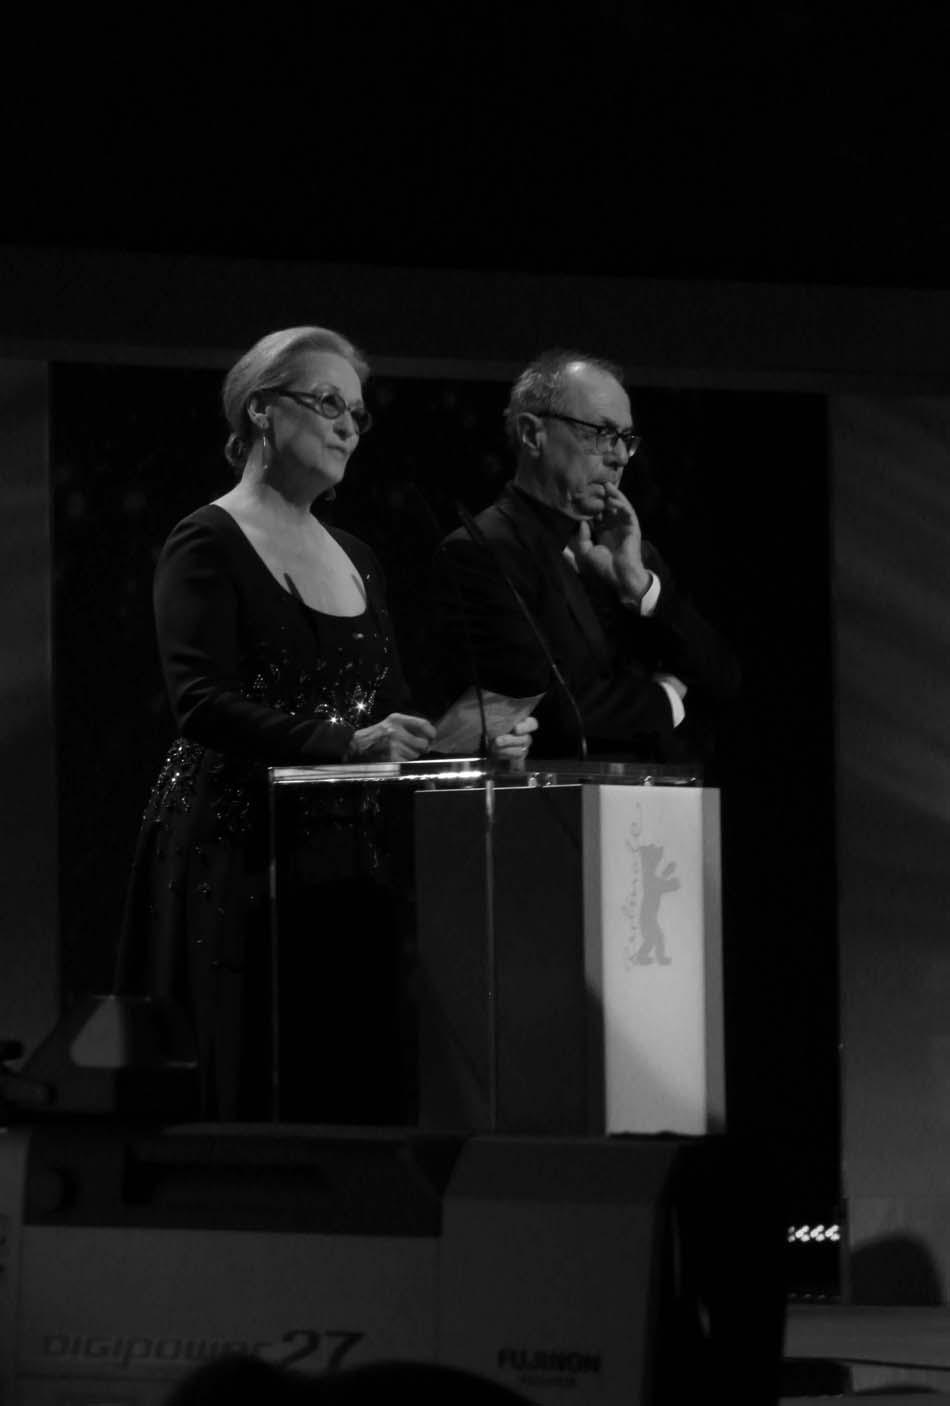 ursula meier heureuse membre du jury la berlinale 2016 daily movies. Black Bedroom Furniture Sets. Home Design Ideas